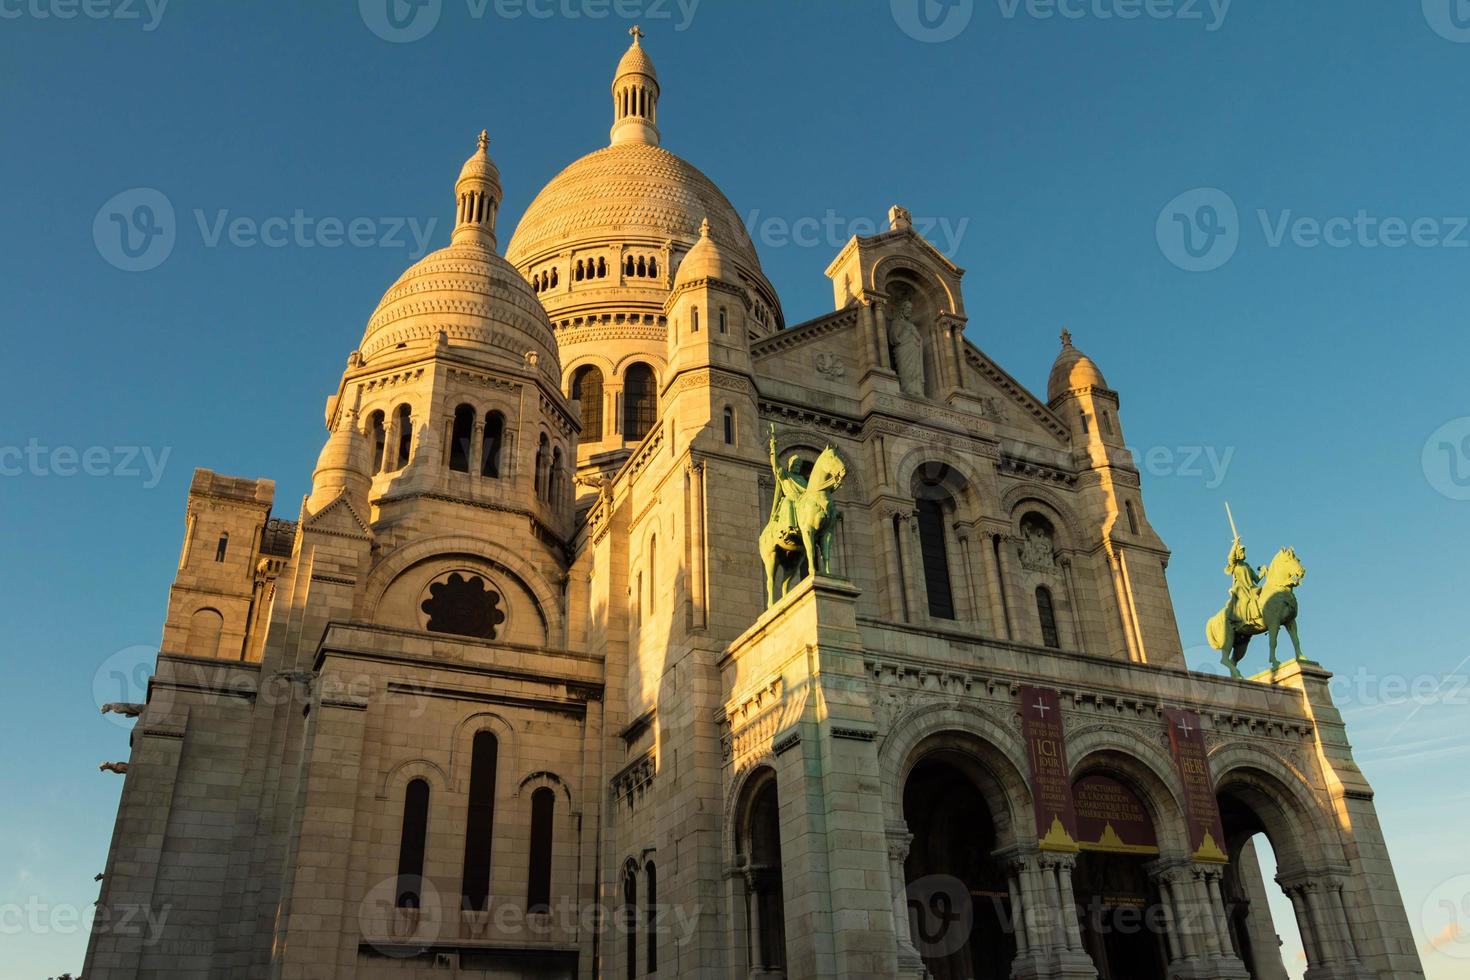 The basilica Sacre Coeur, Paris, France. photo